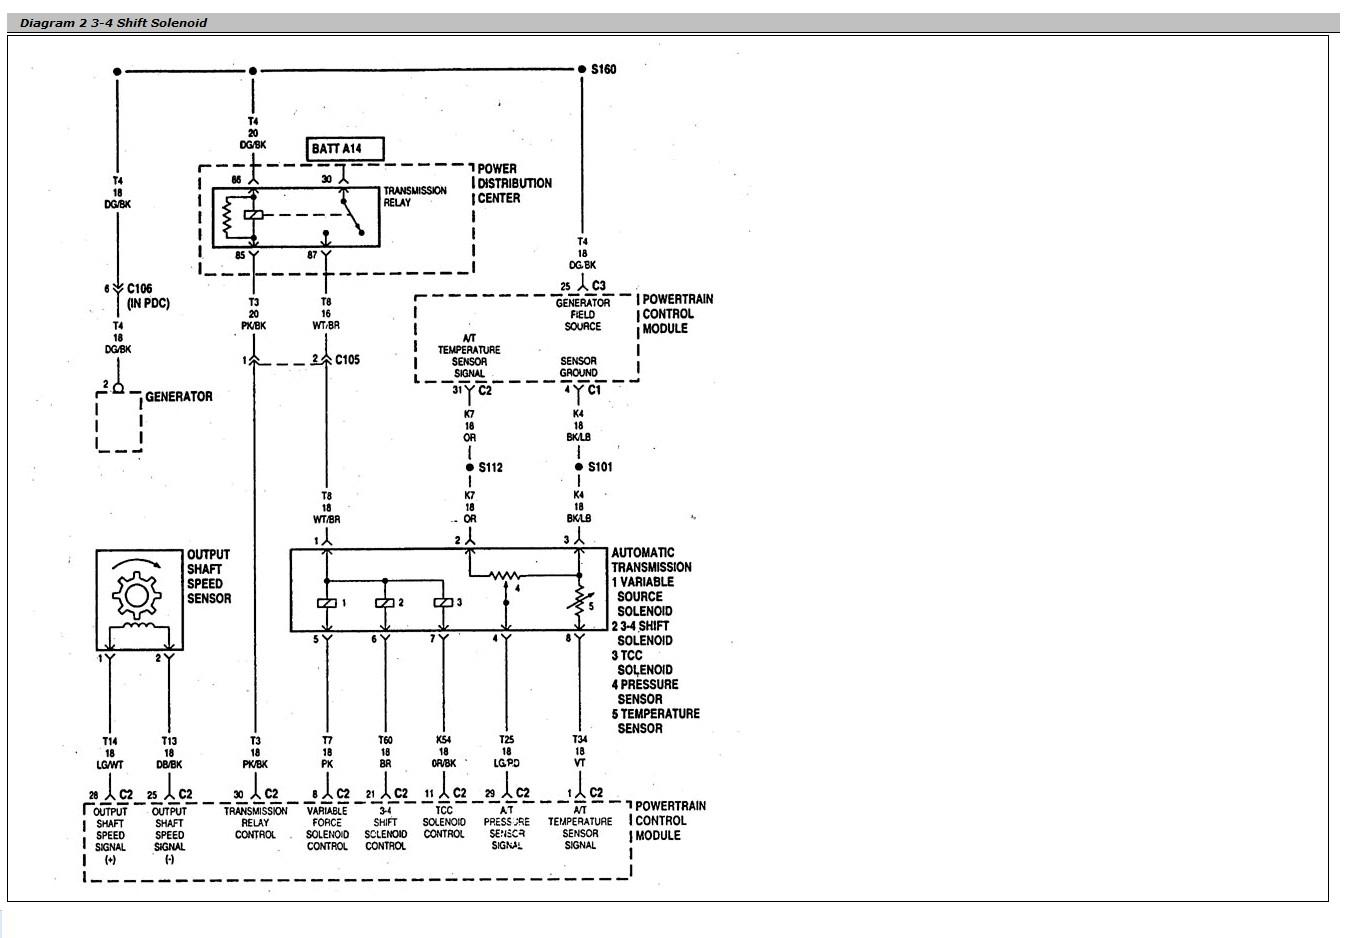 mitsubishi transmission solenoid wiring diagram wiring library rh 47 yoobi de 12 Volt Solenoid Wiring Diagram Golf Cart Solenoid Wiring Diagram